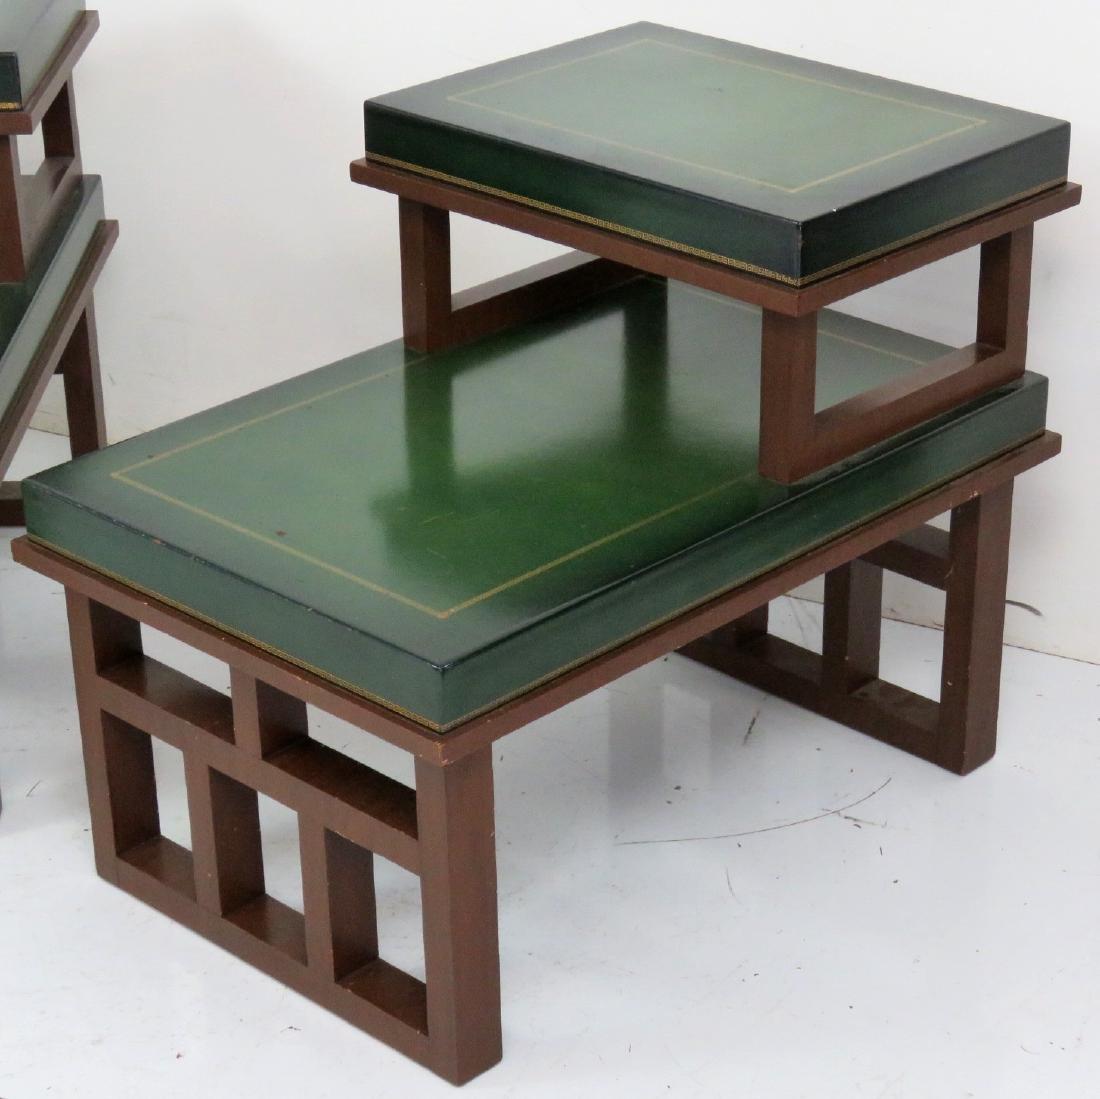 Pair PARZINGER STYLE ART MODERN END TABLES - 2